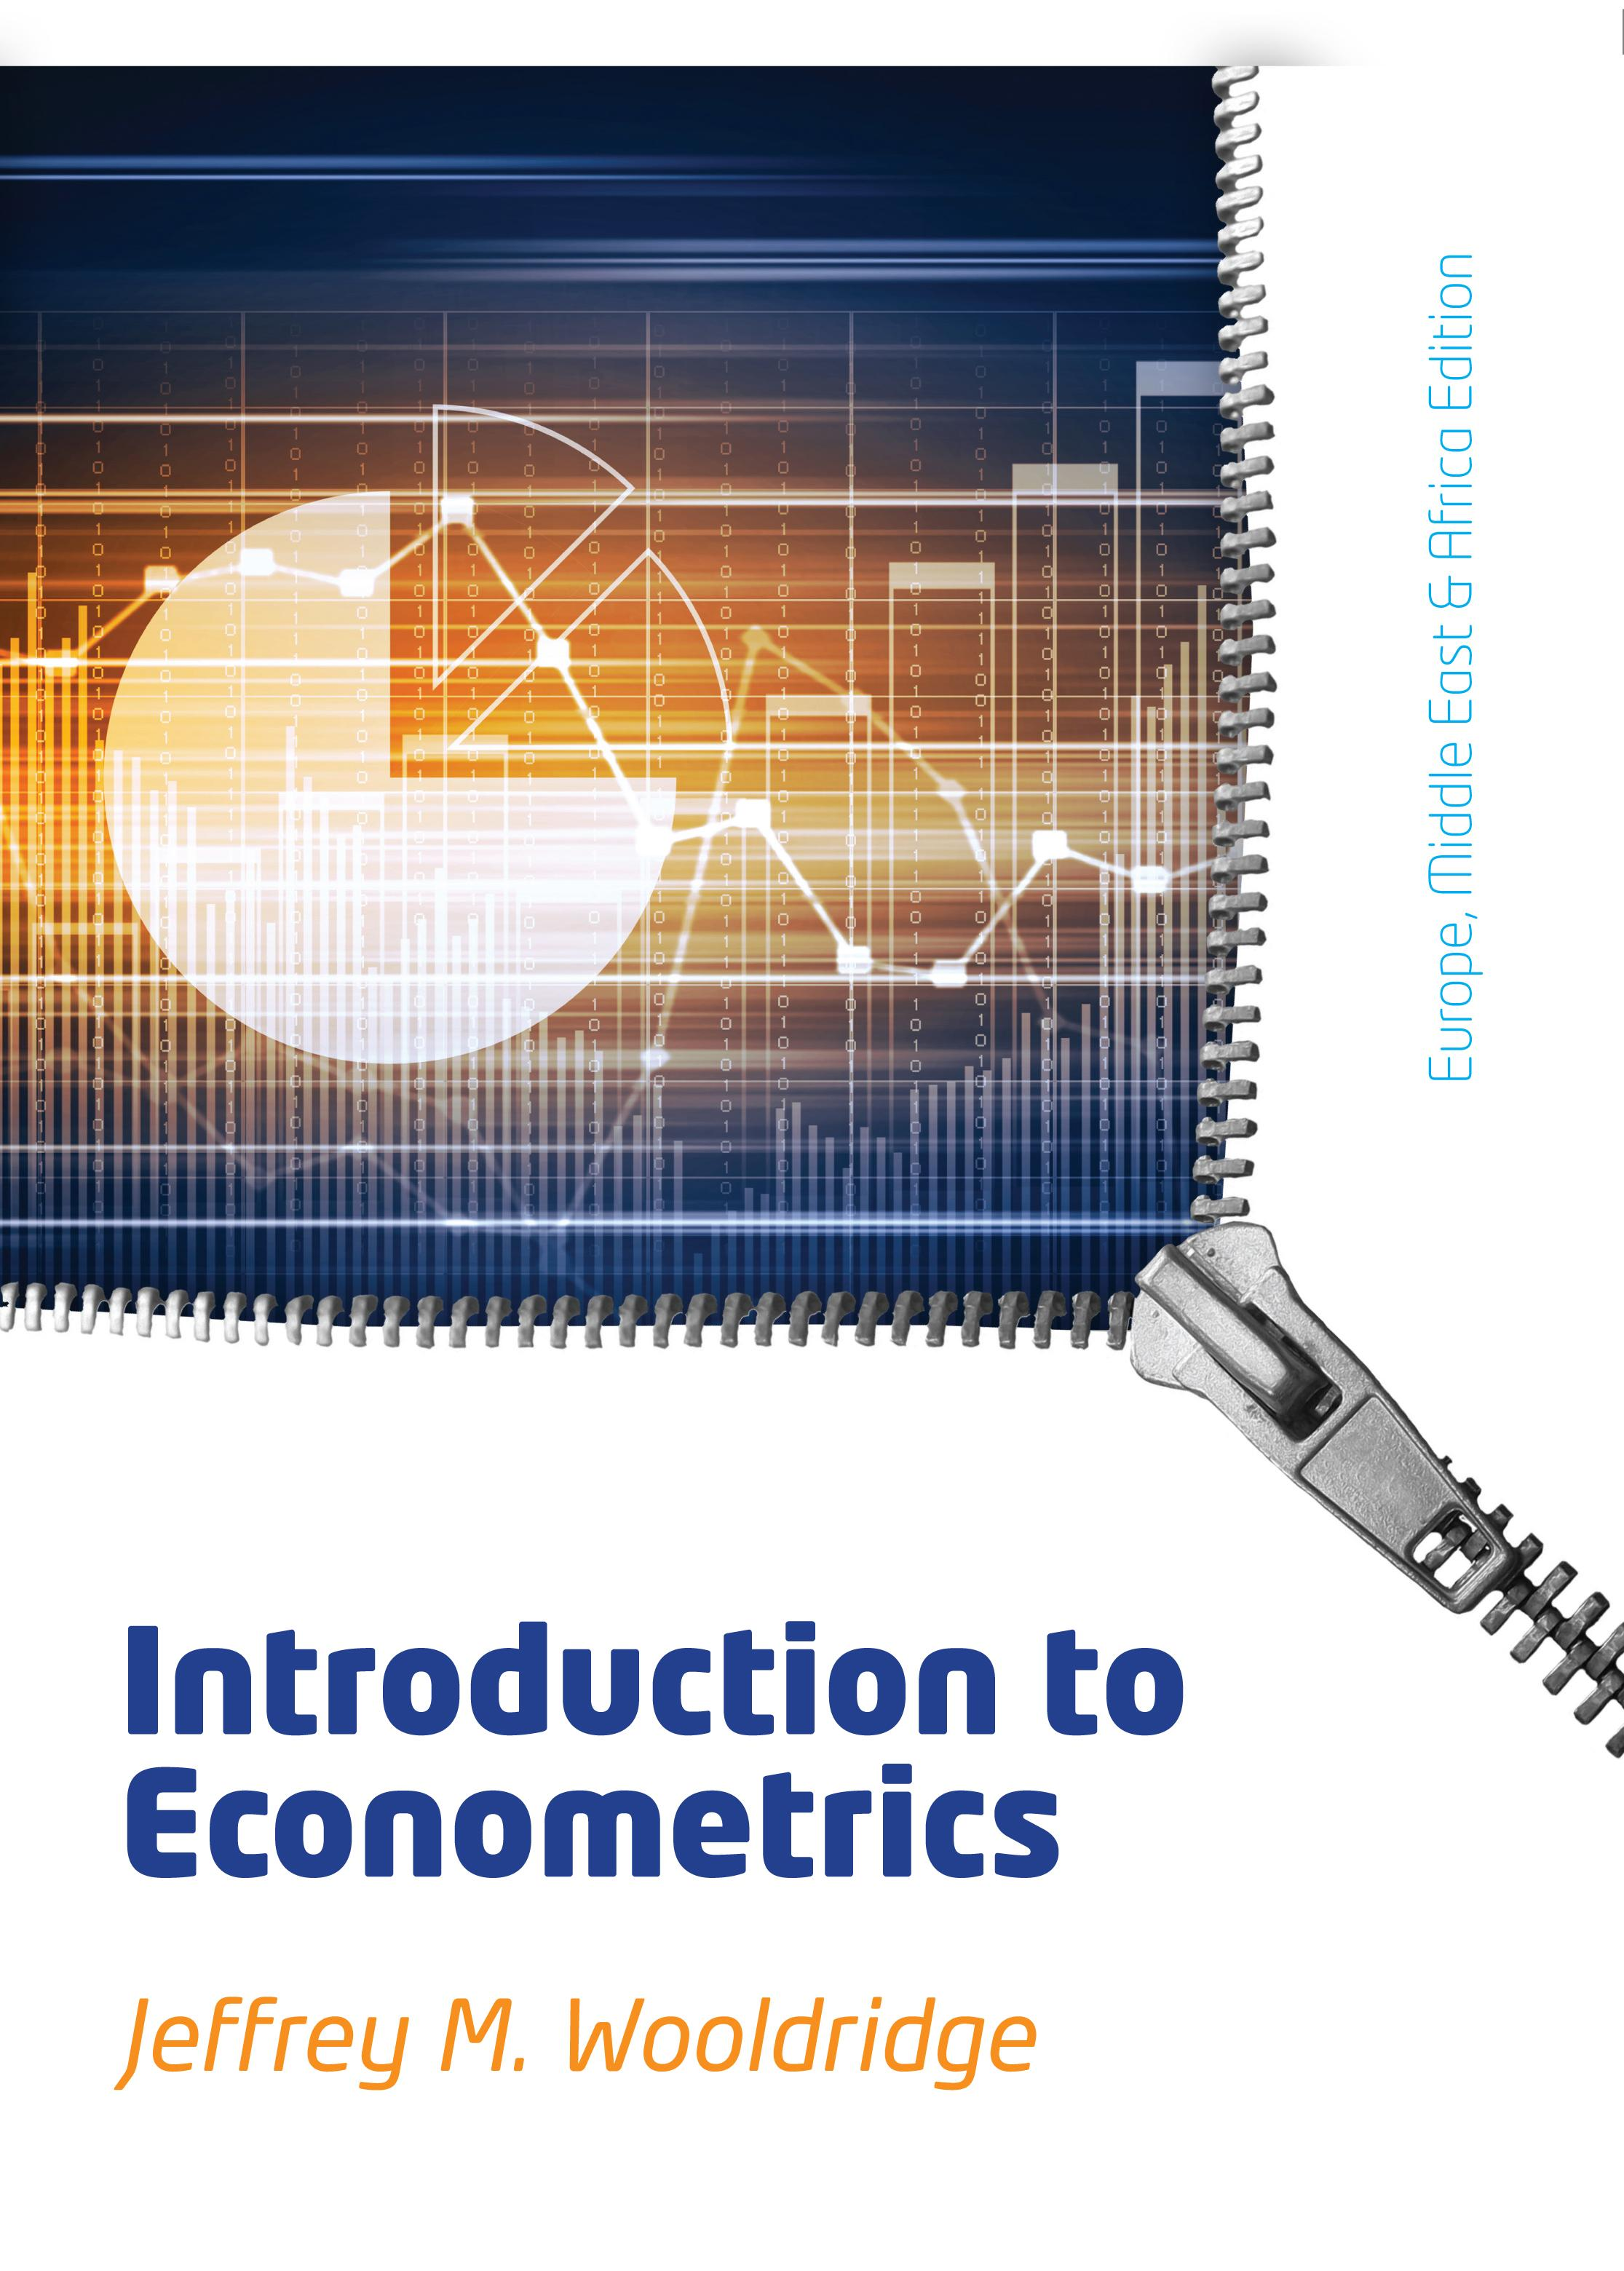 Introduction to Econometrics  EMEA Edition  Jeffrey Wooldridge  Taschenbuch  Englisch  2013